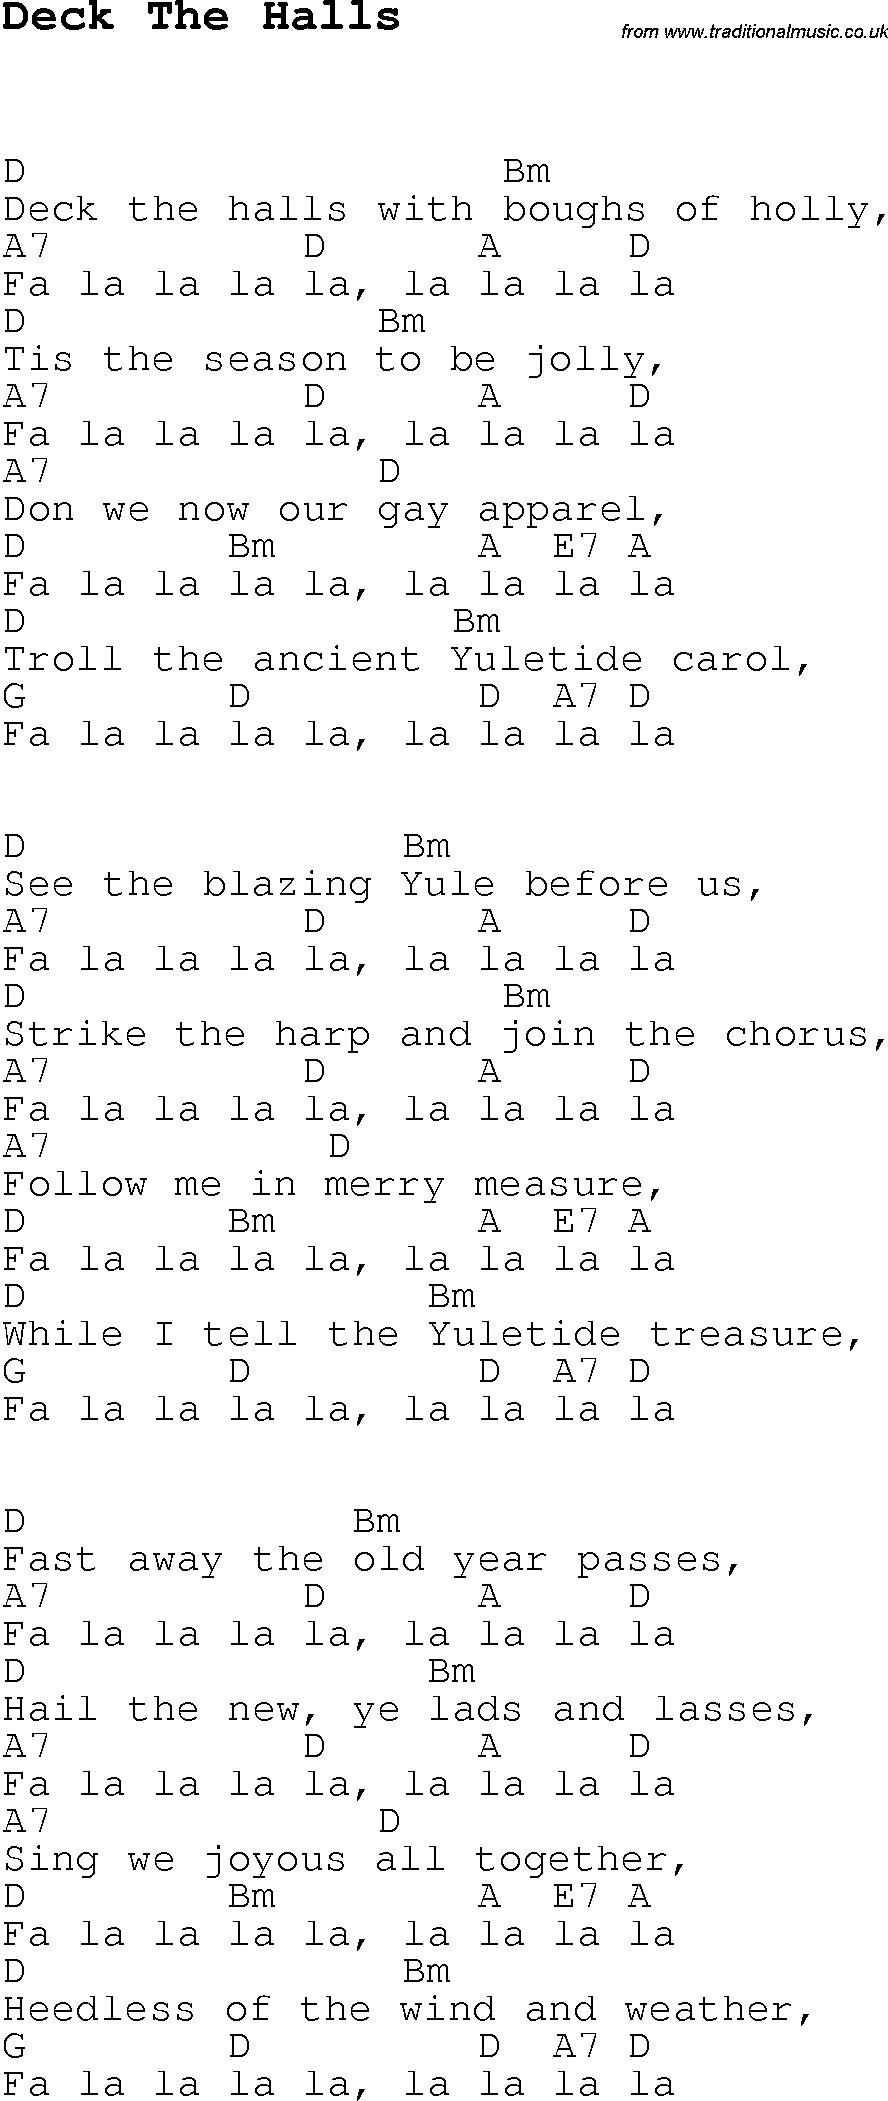 Deck The Halls Christmas Song  deck the halls lyrics DriverLayer Search Engine